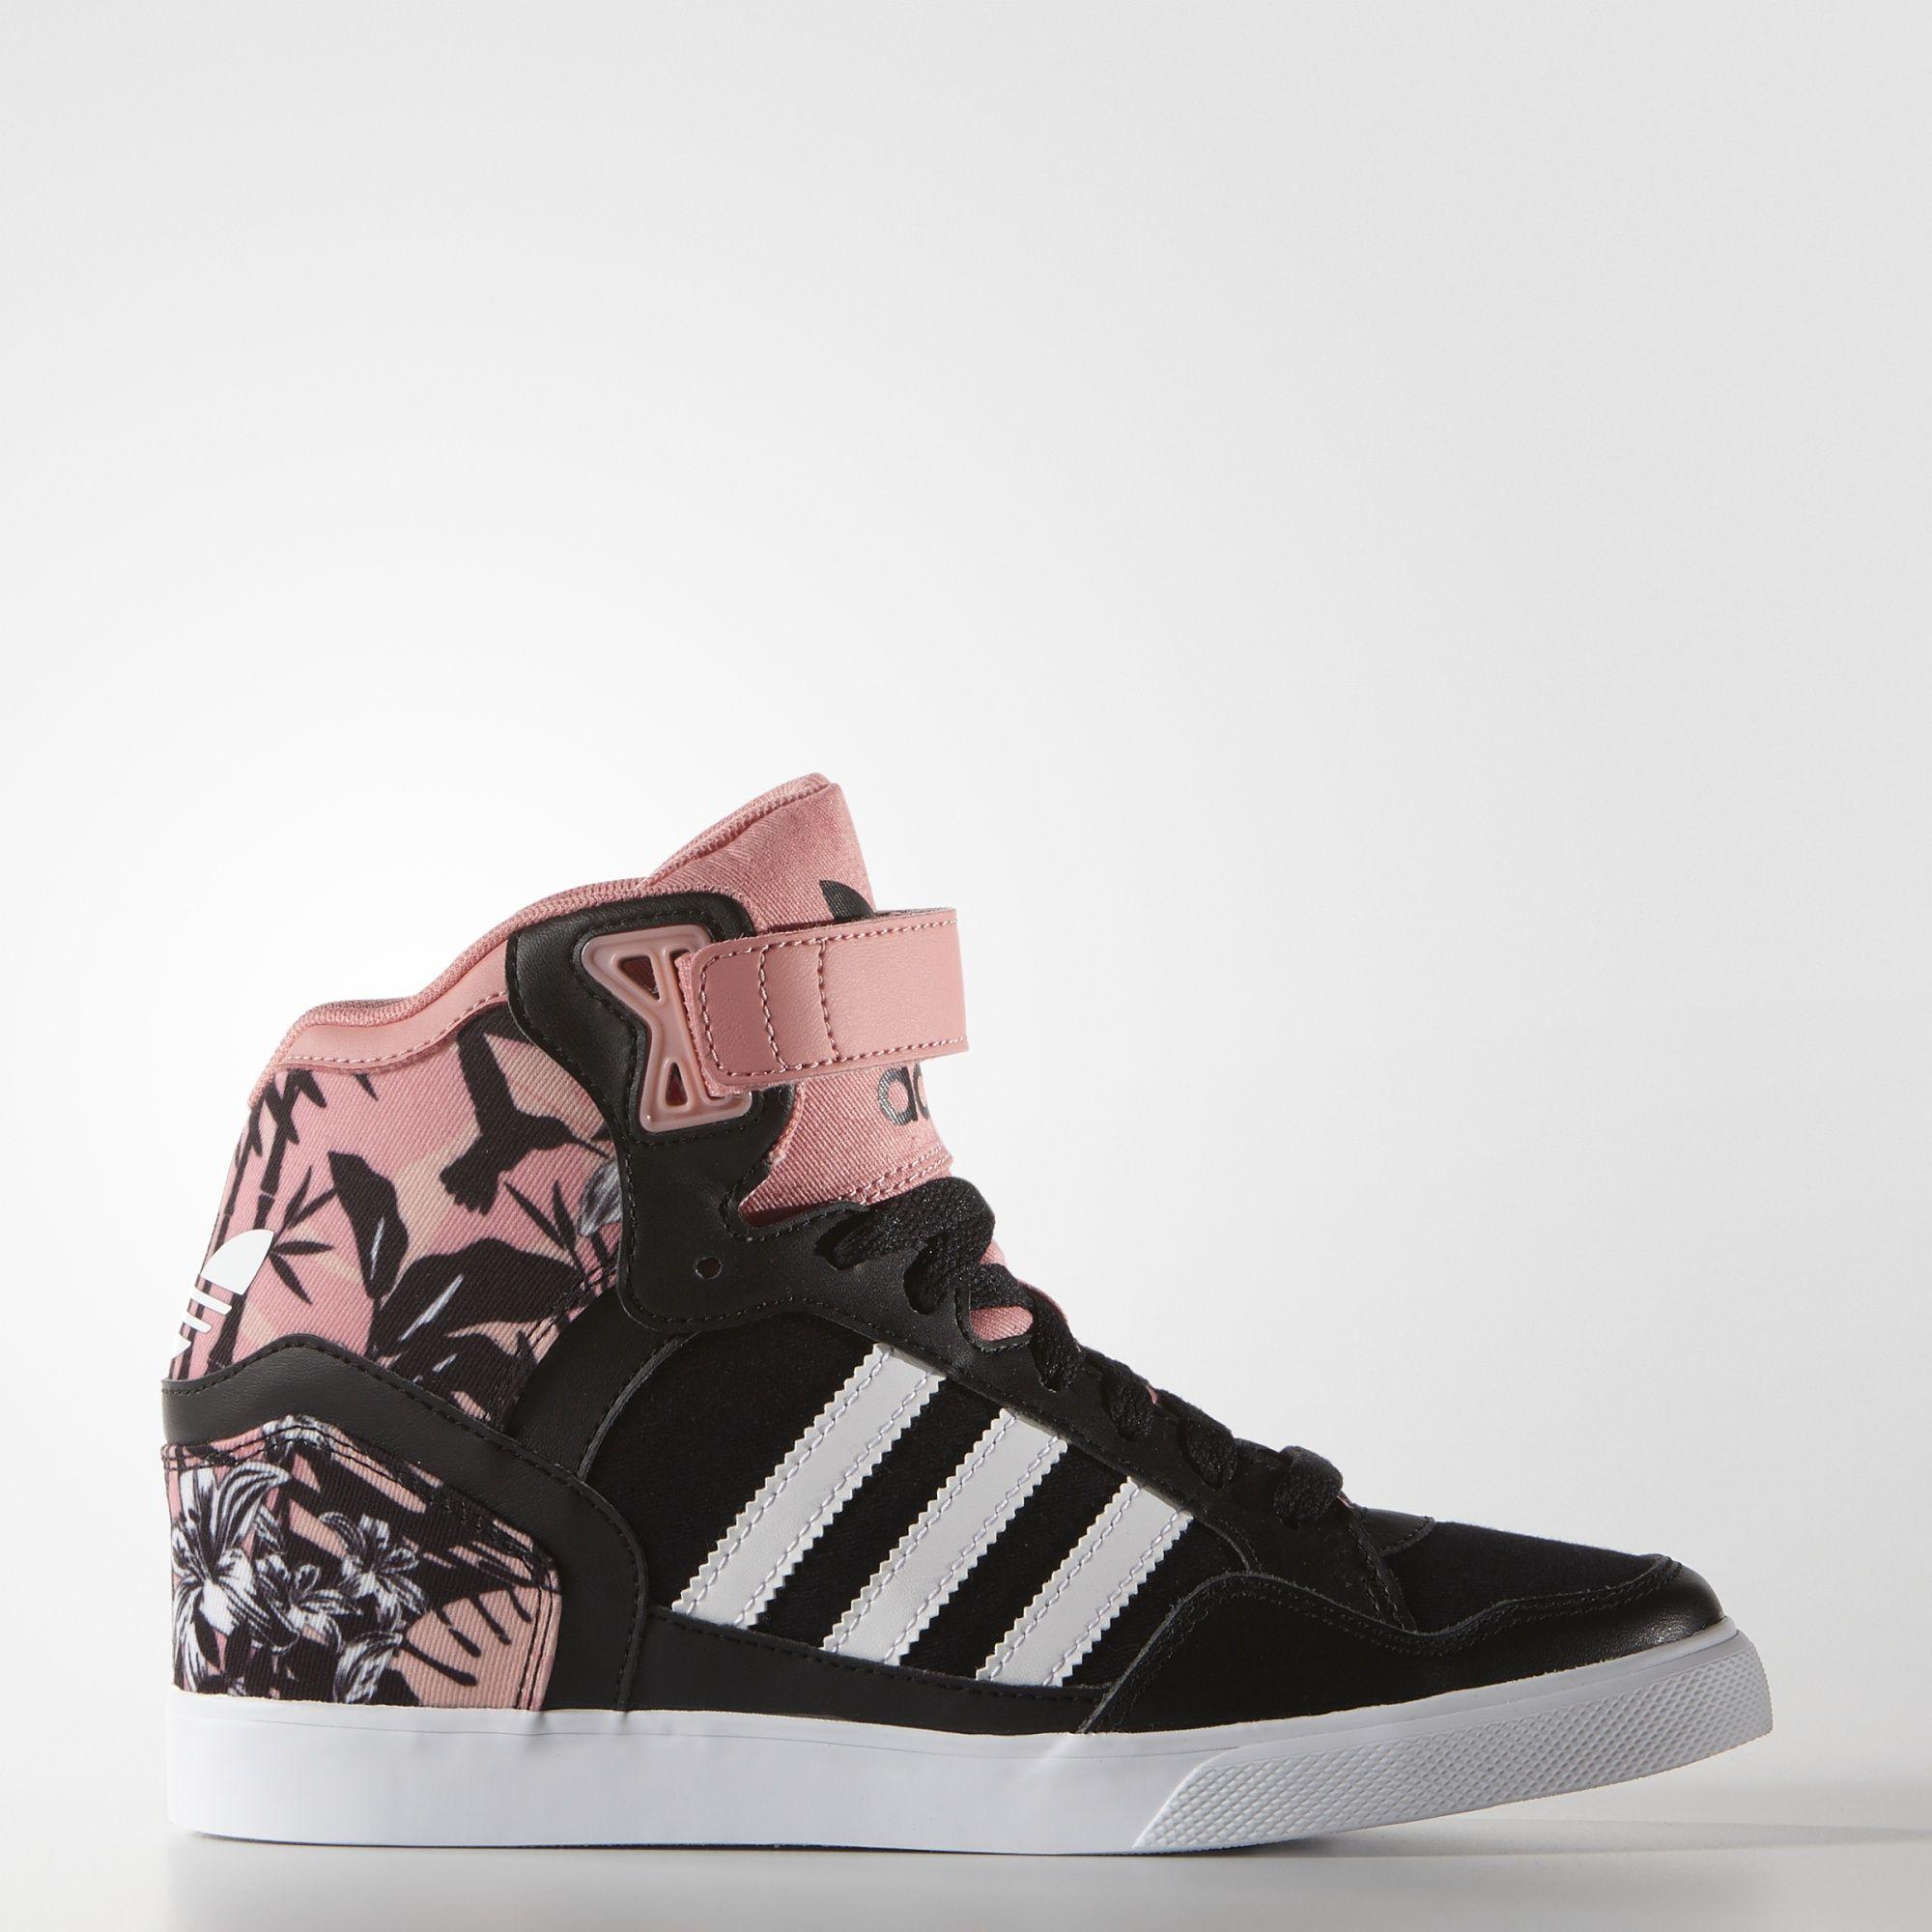 Extaball Shoes BlackUs Botitas Adidas 2016 Up UMpSzV